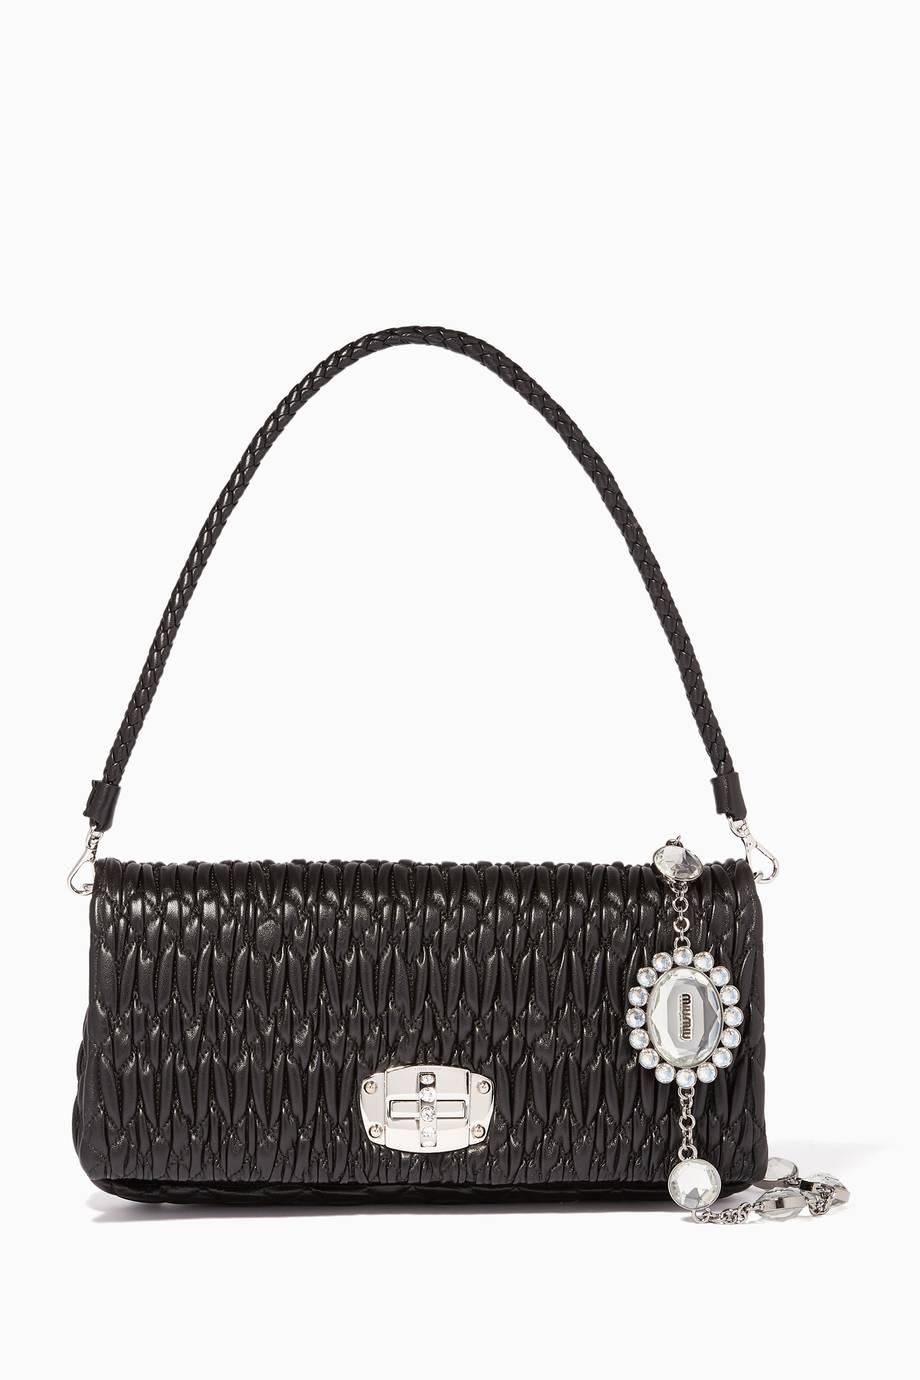 bd0e3d24592e Shop Luxury Miu Miu Black Large Iconic Crystal Shoulder Bag